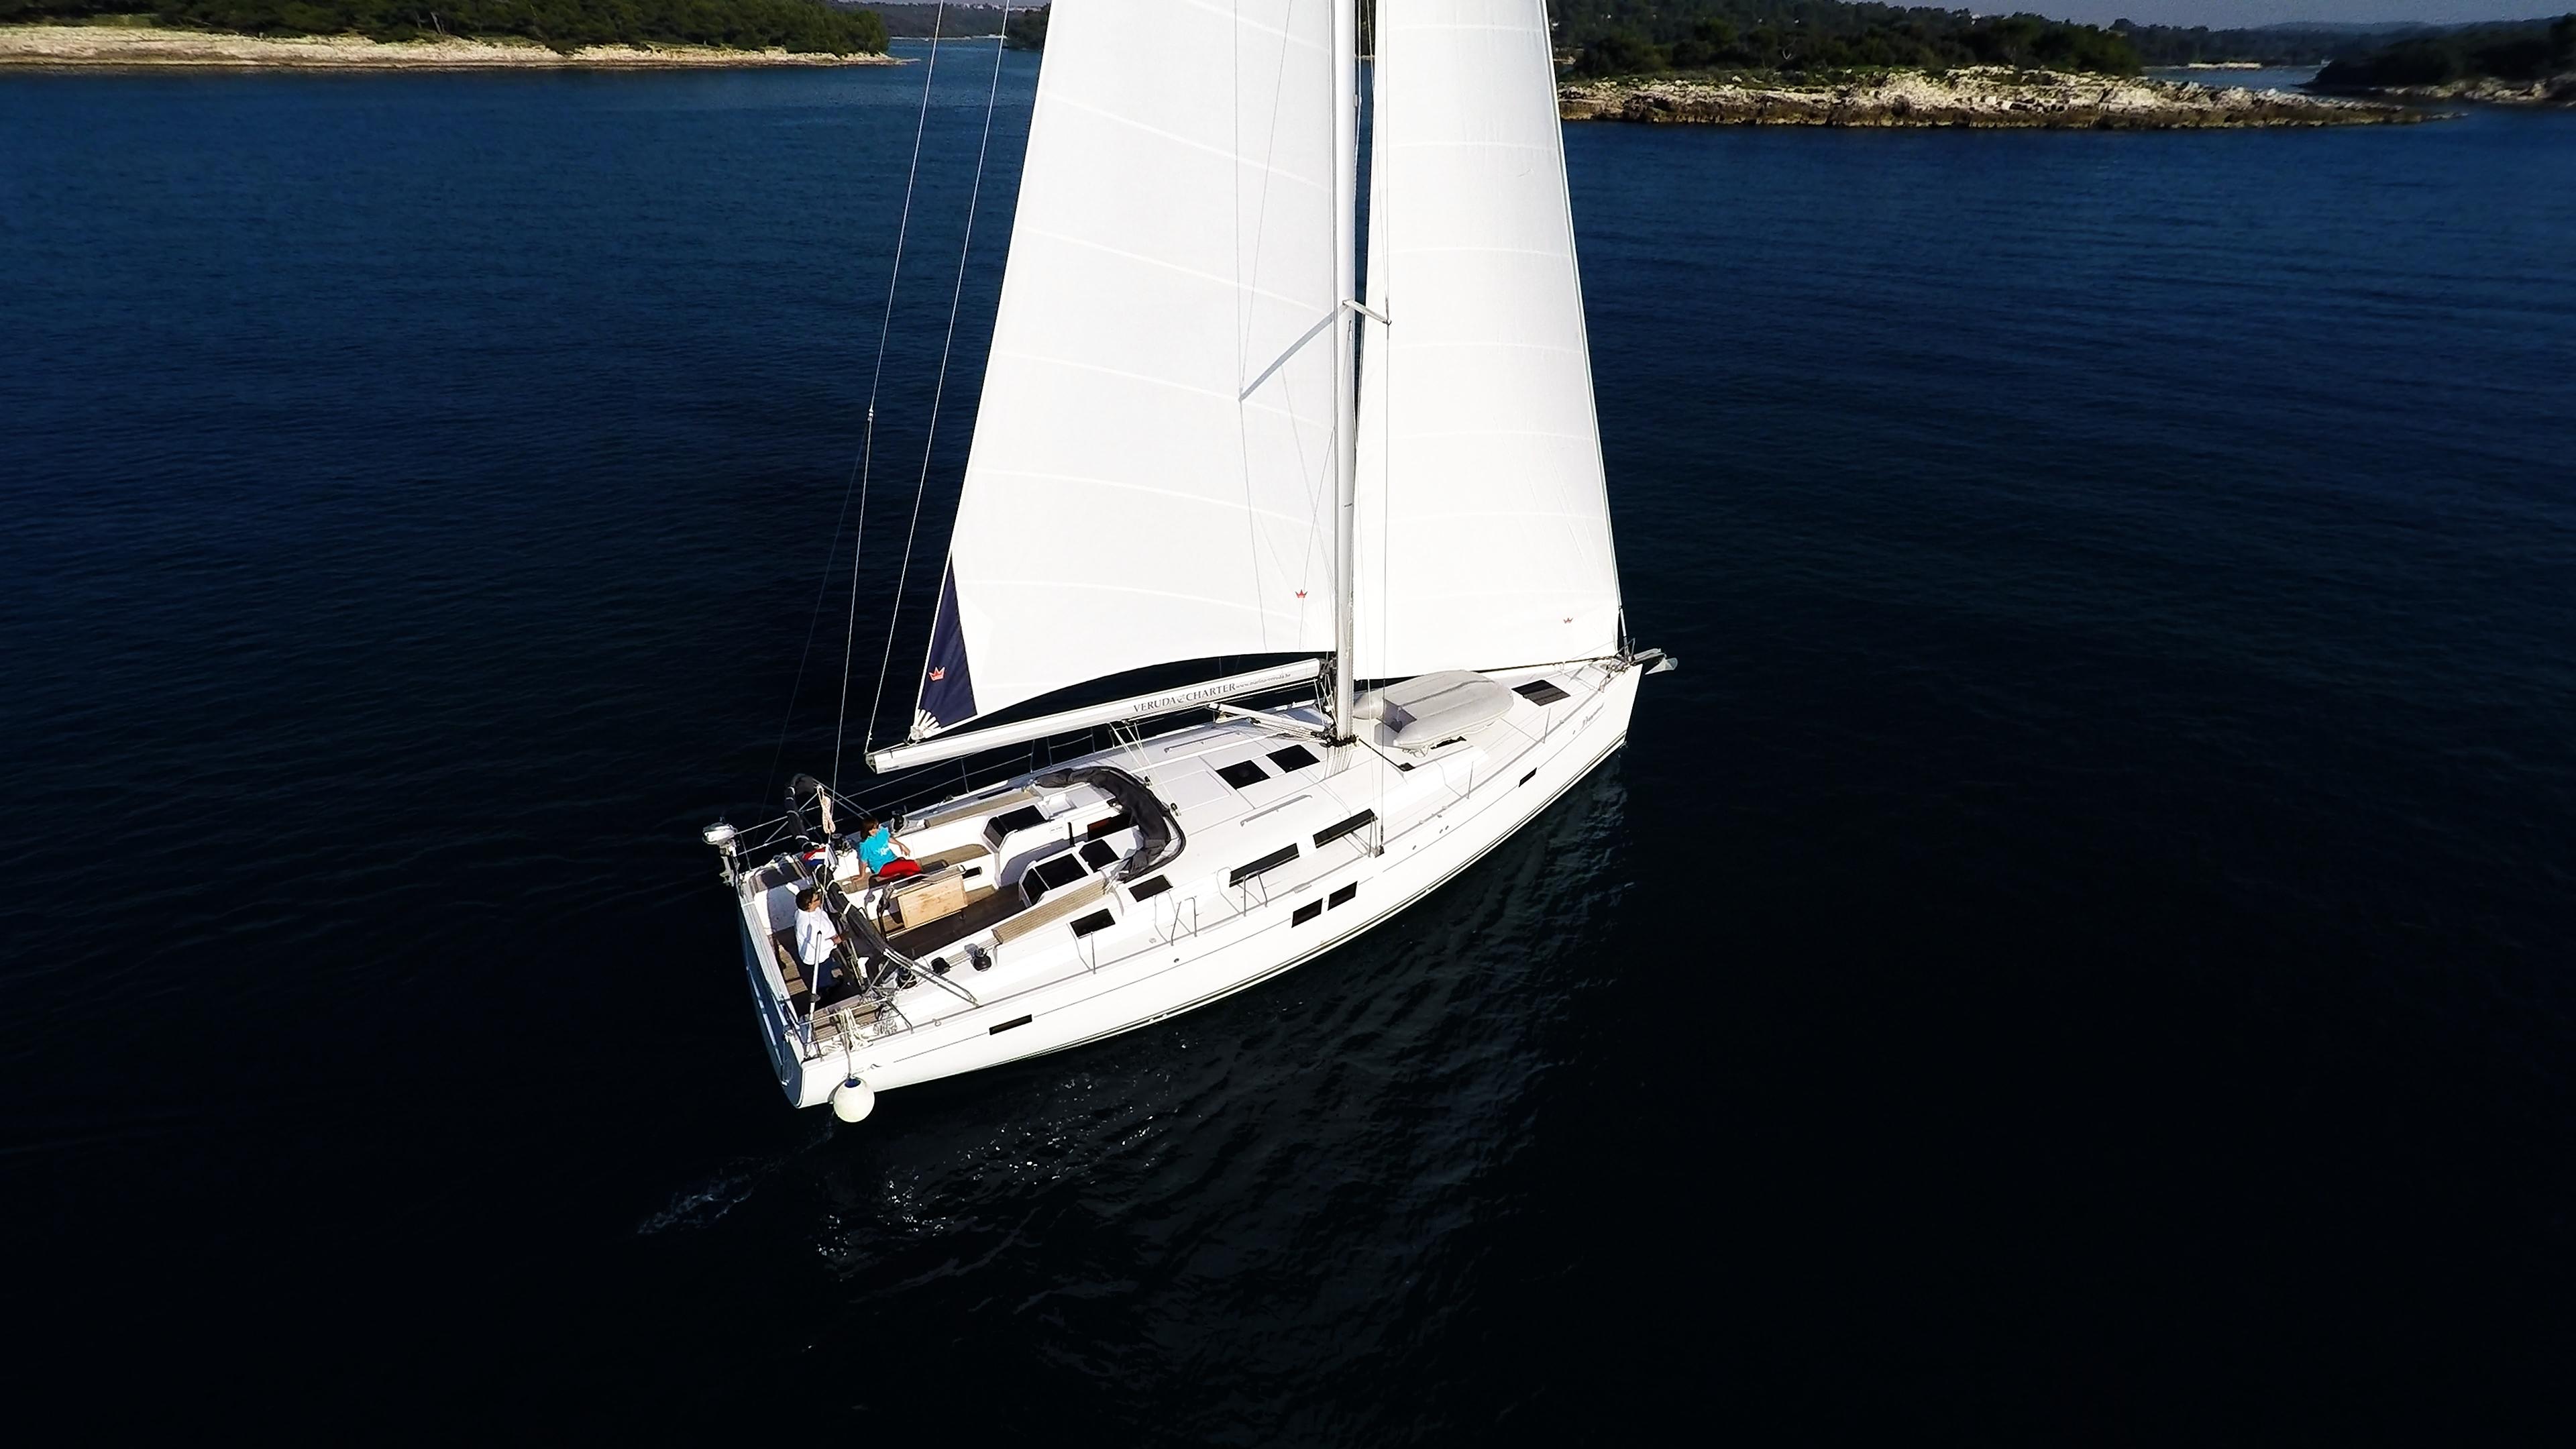 barcha a vela Hanse 505 yacht a vela barca vele ponte pozzetto